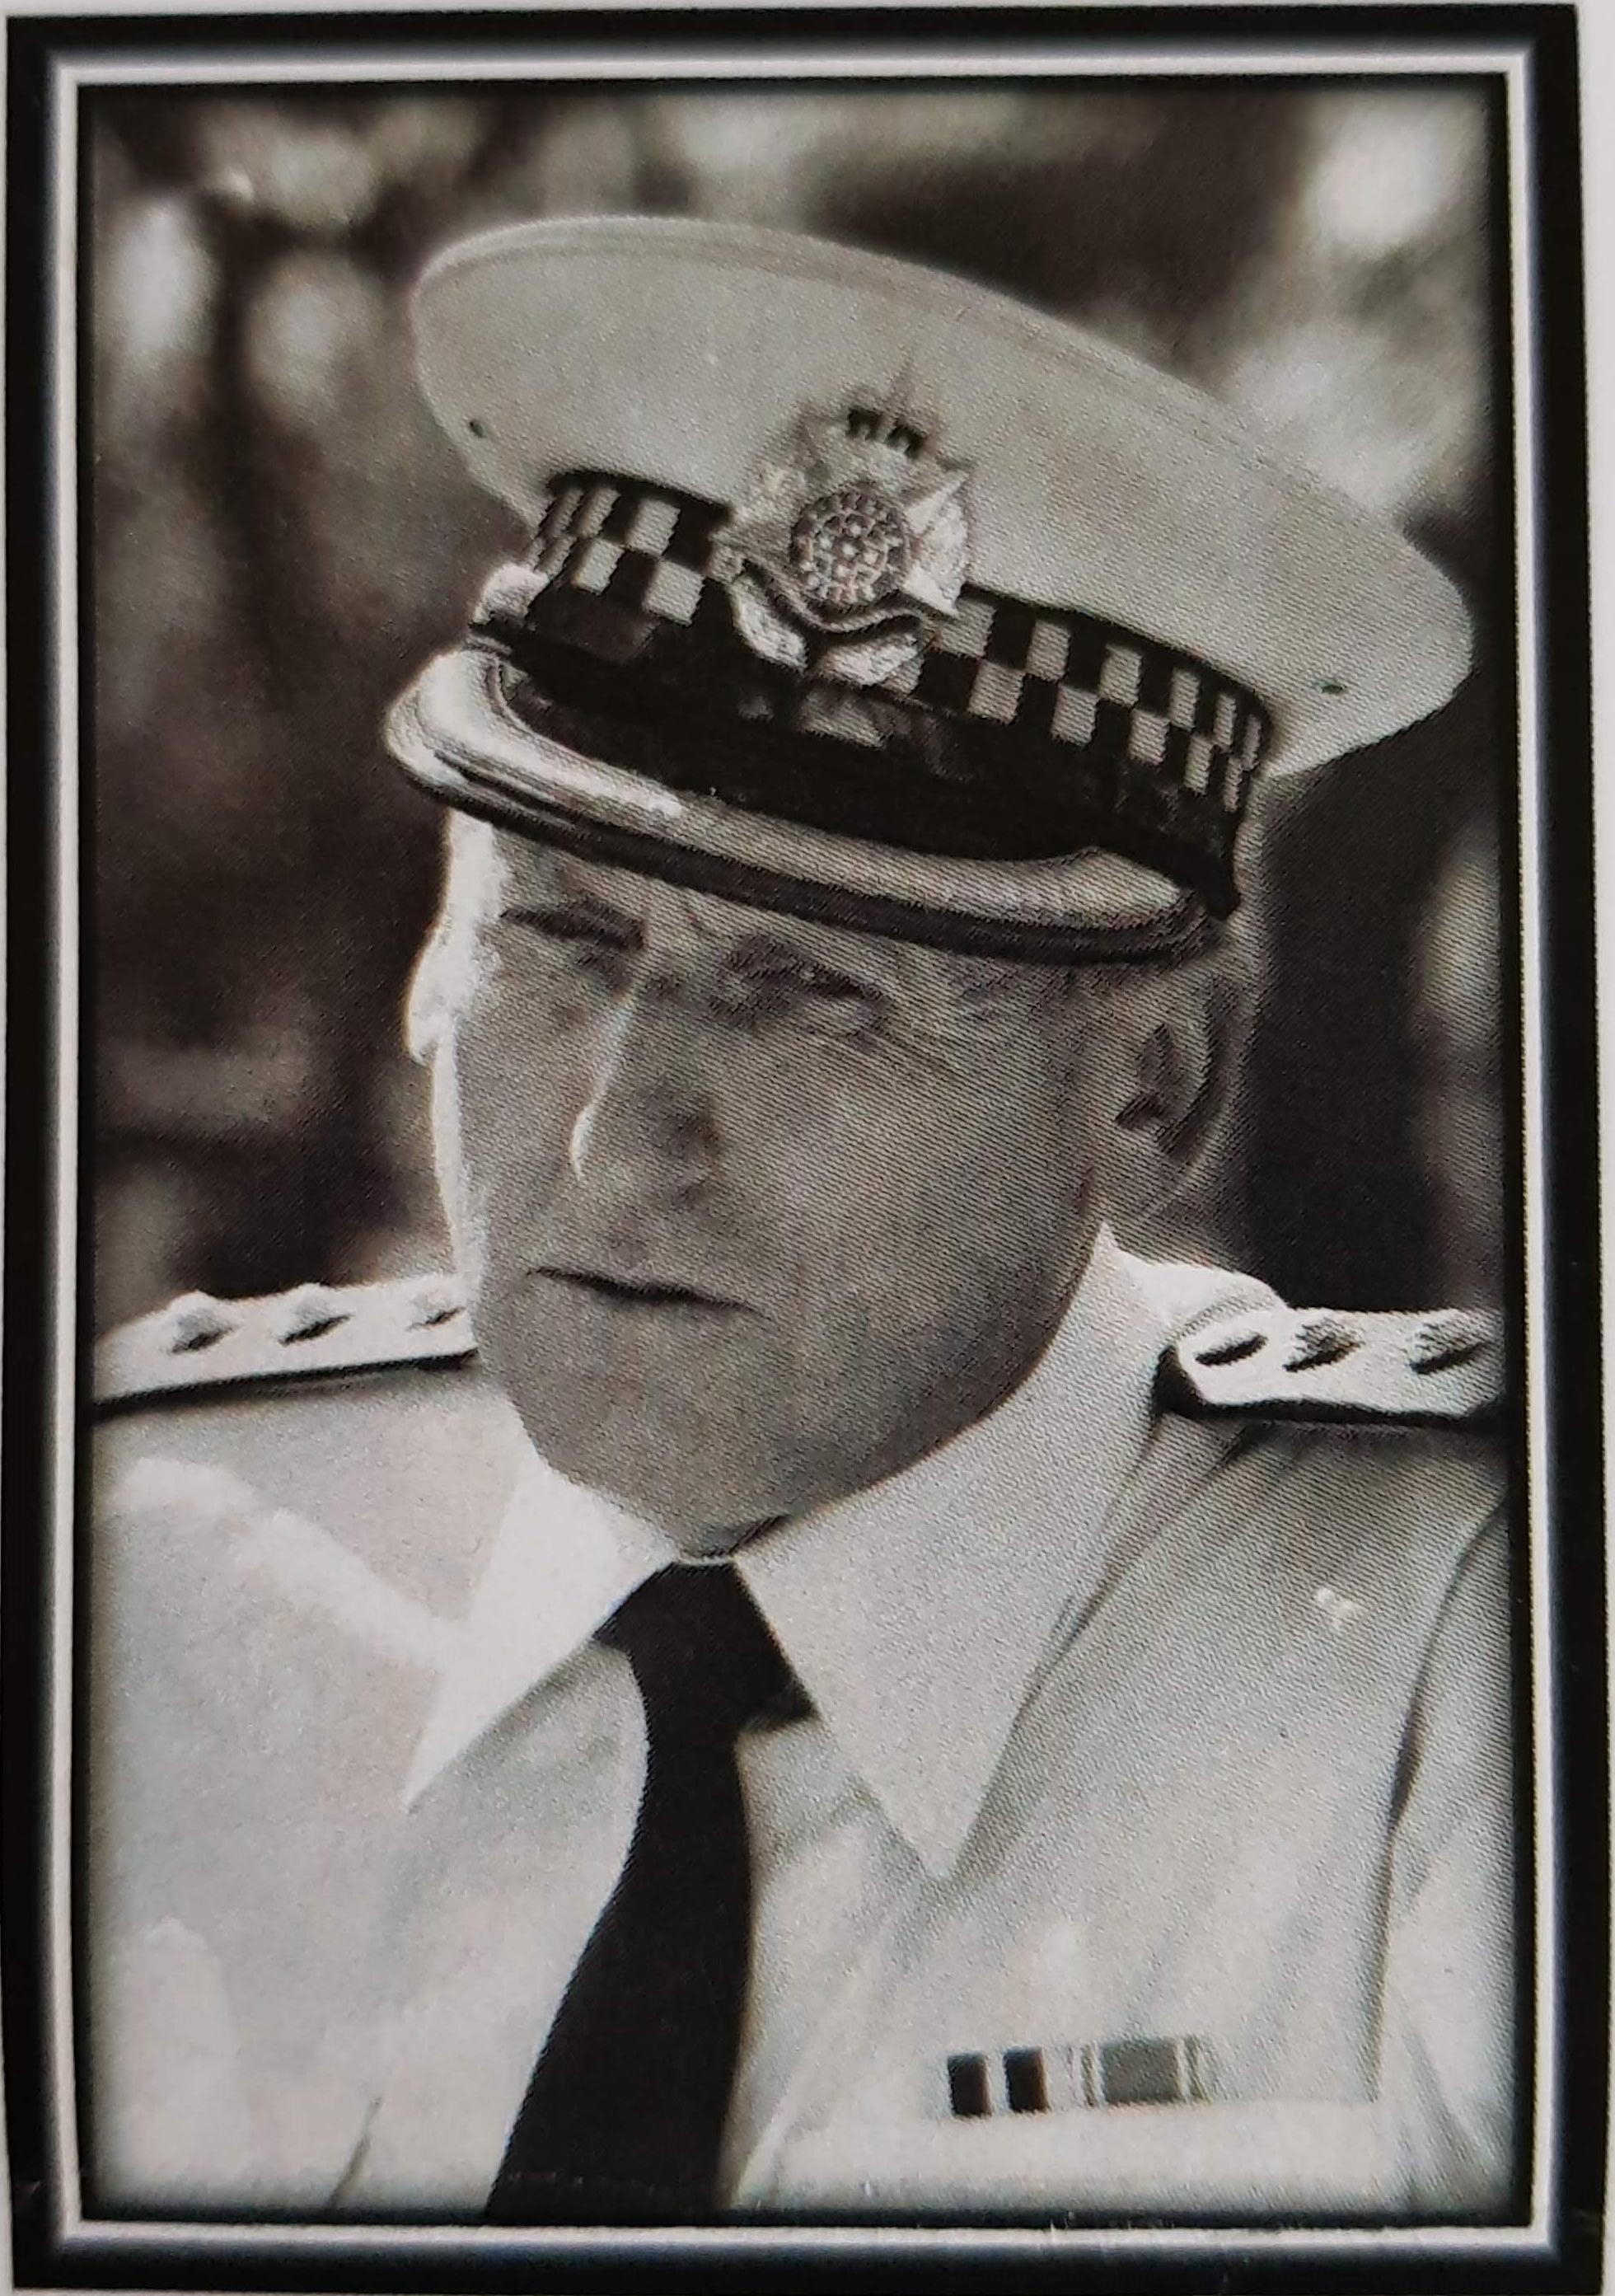 Bill Brand in uniform